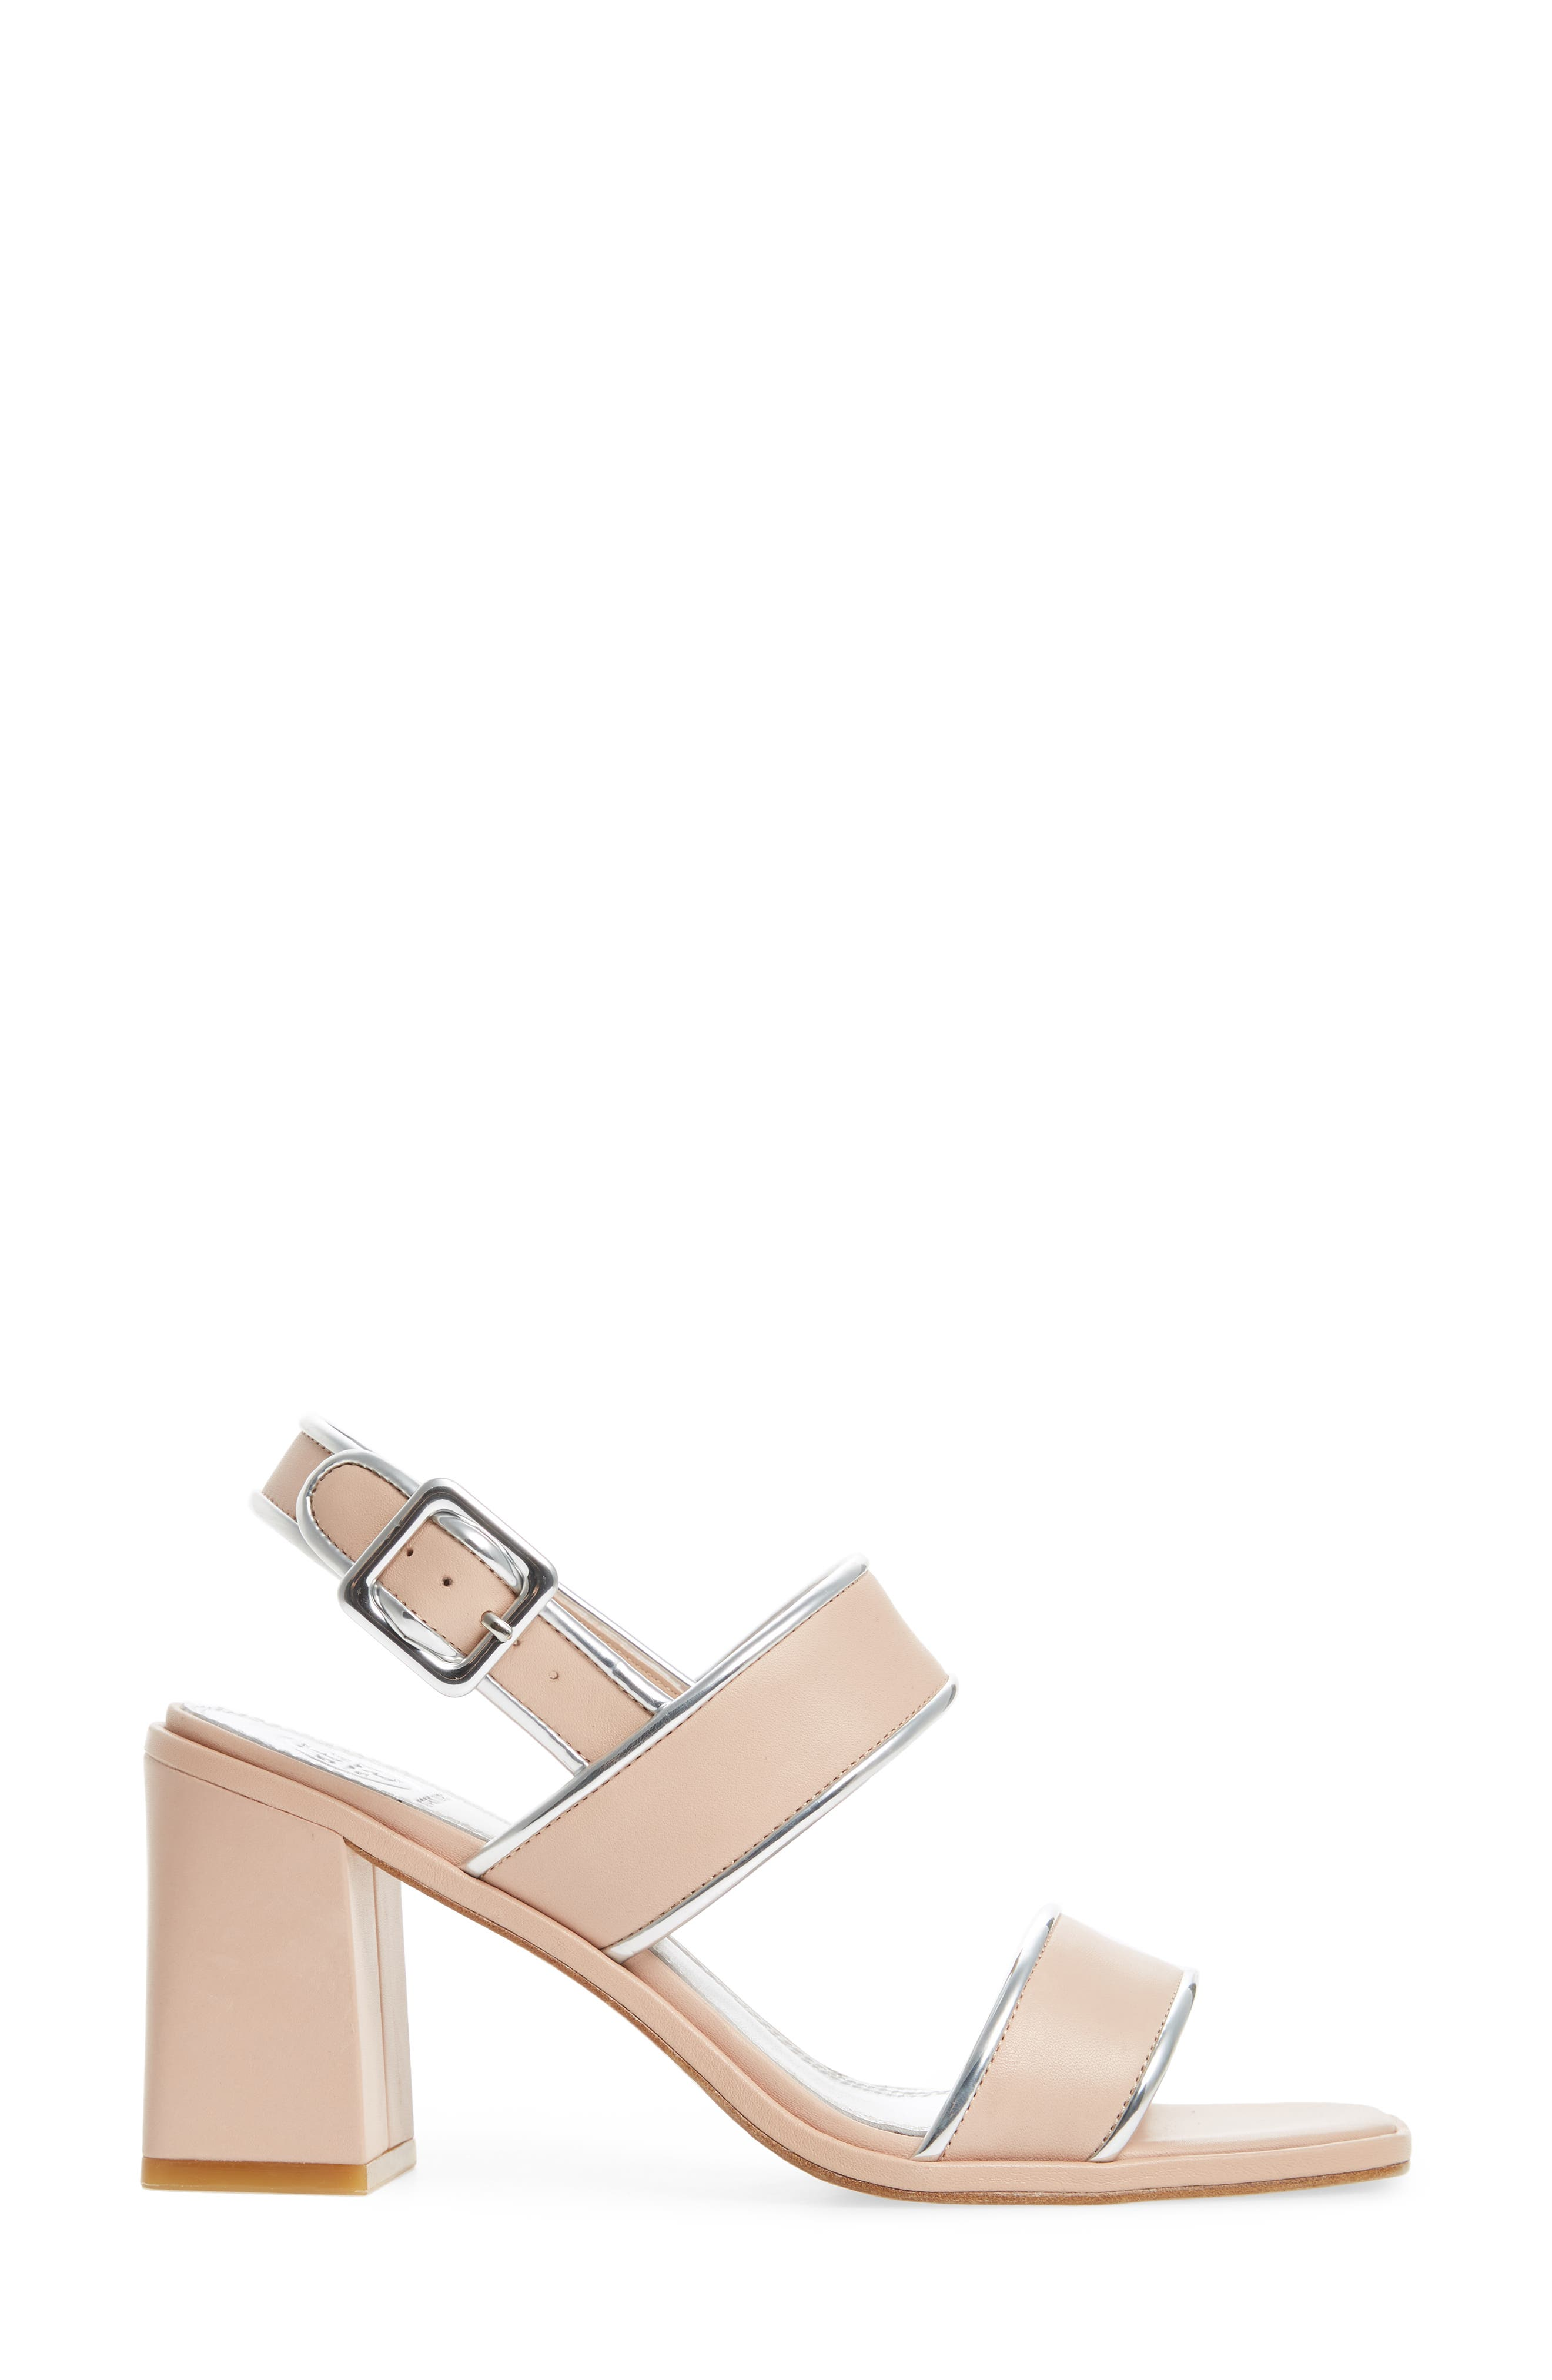 Delaney Double Strap Sandal,                             Alternate thumbnail 3, color,                             Goan Sand/ Silver